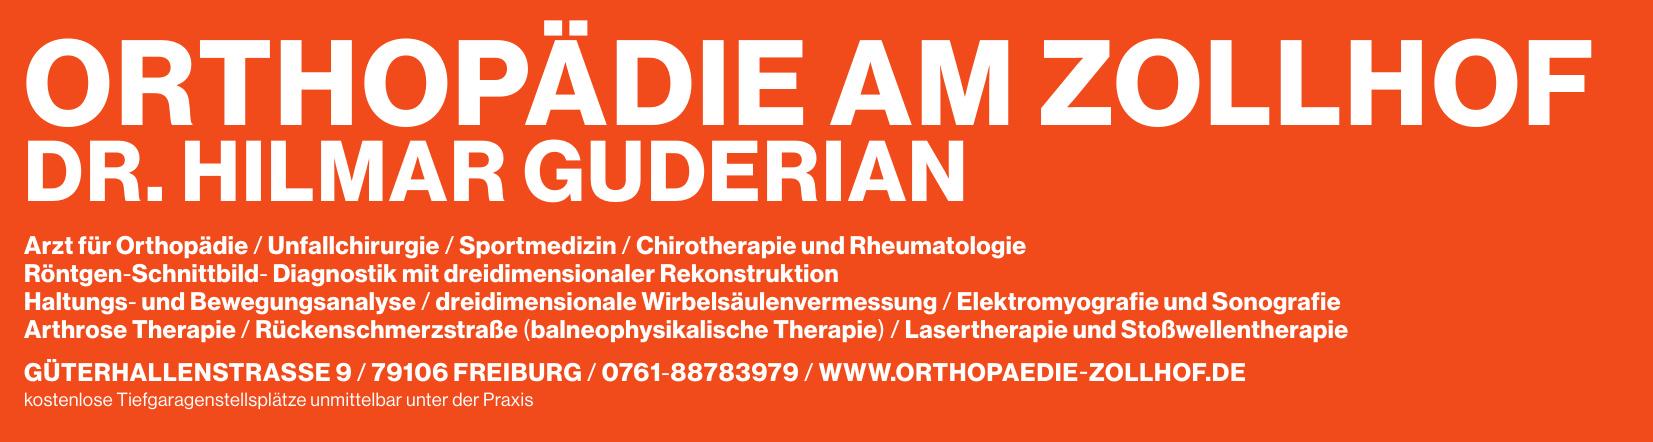 Orthopädie am Zollhof Dr. Hilmar Guderian